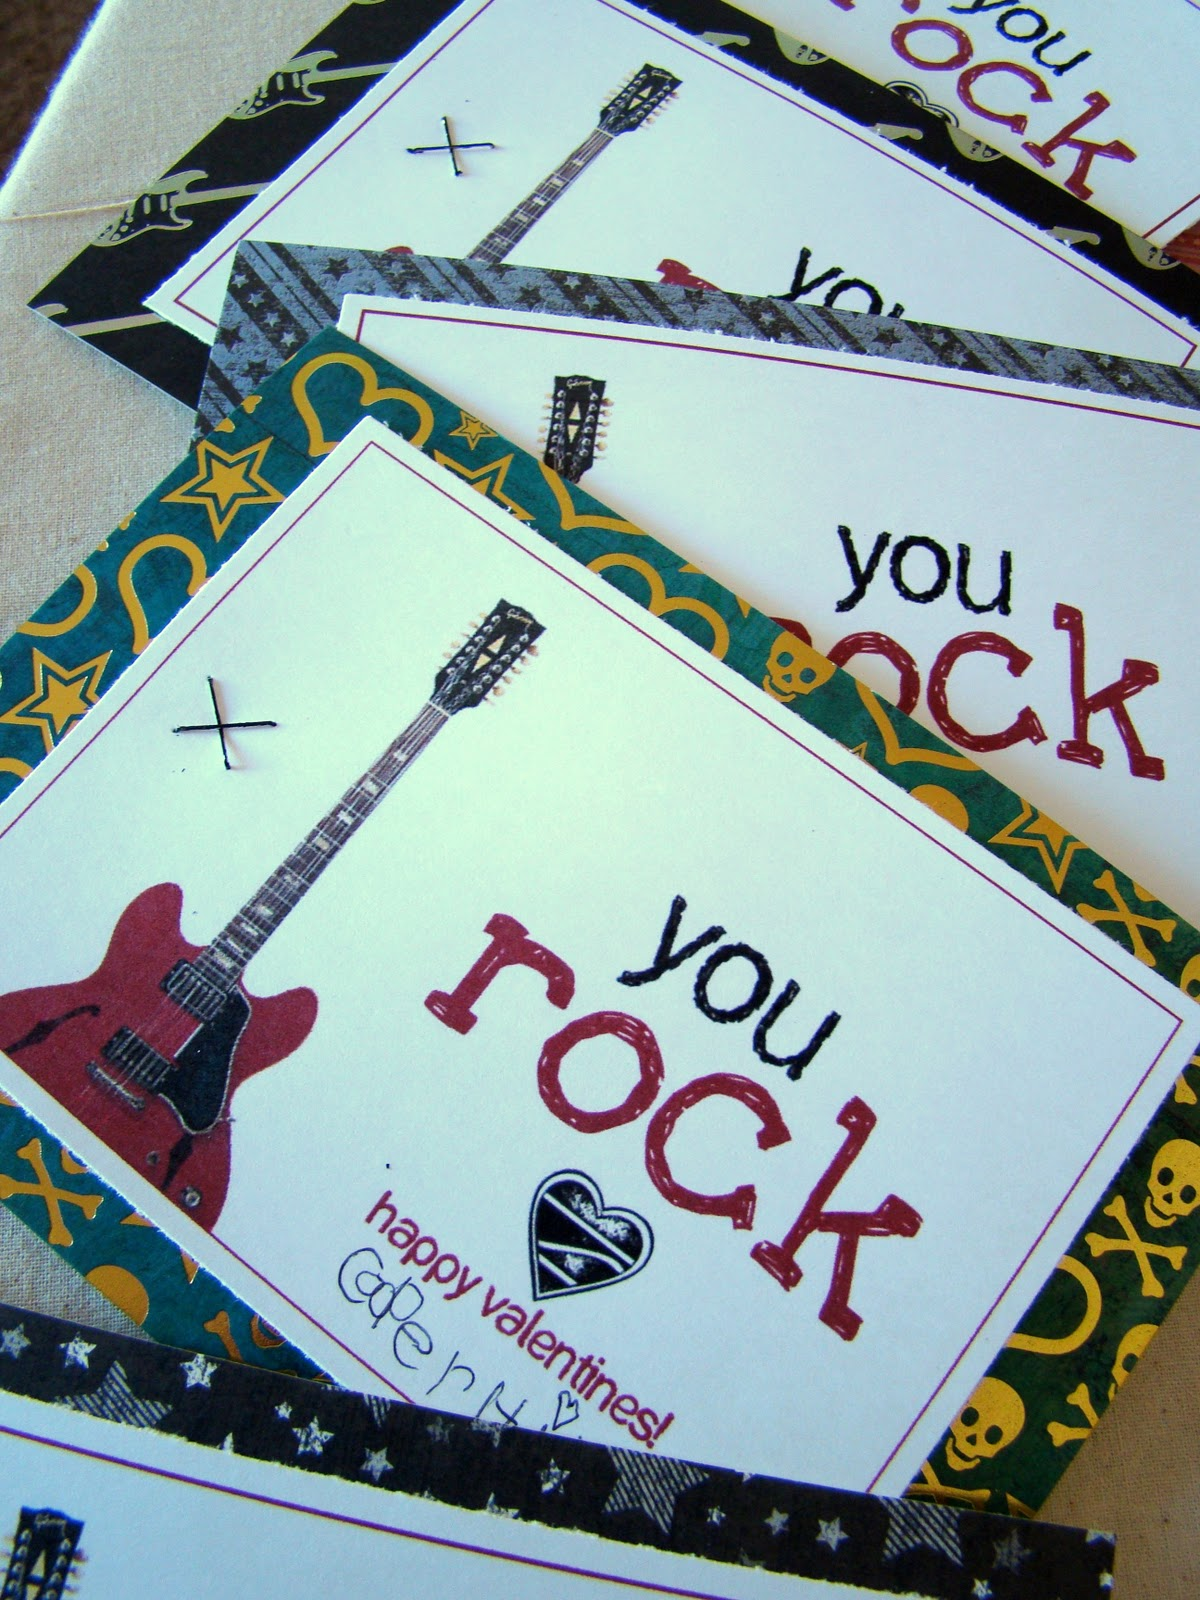 graphic regarding Pop Rocks Valentines Printable known as tHe fiCkLe piCkLe: RoCkiN Clroom Valentines